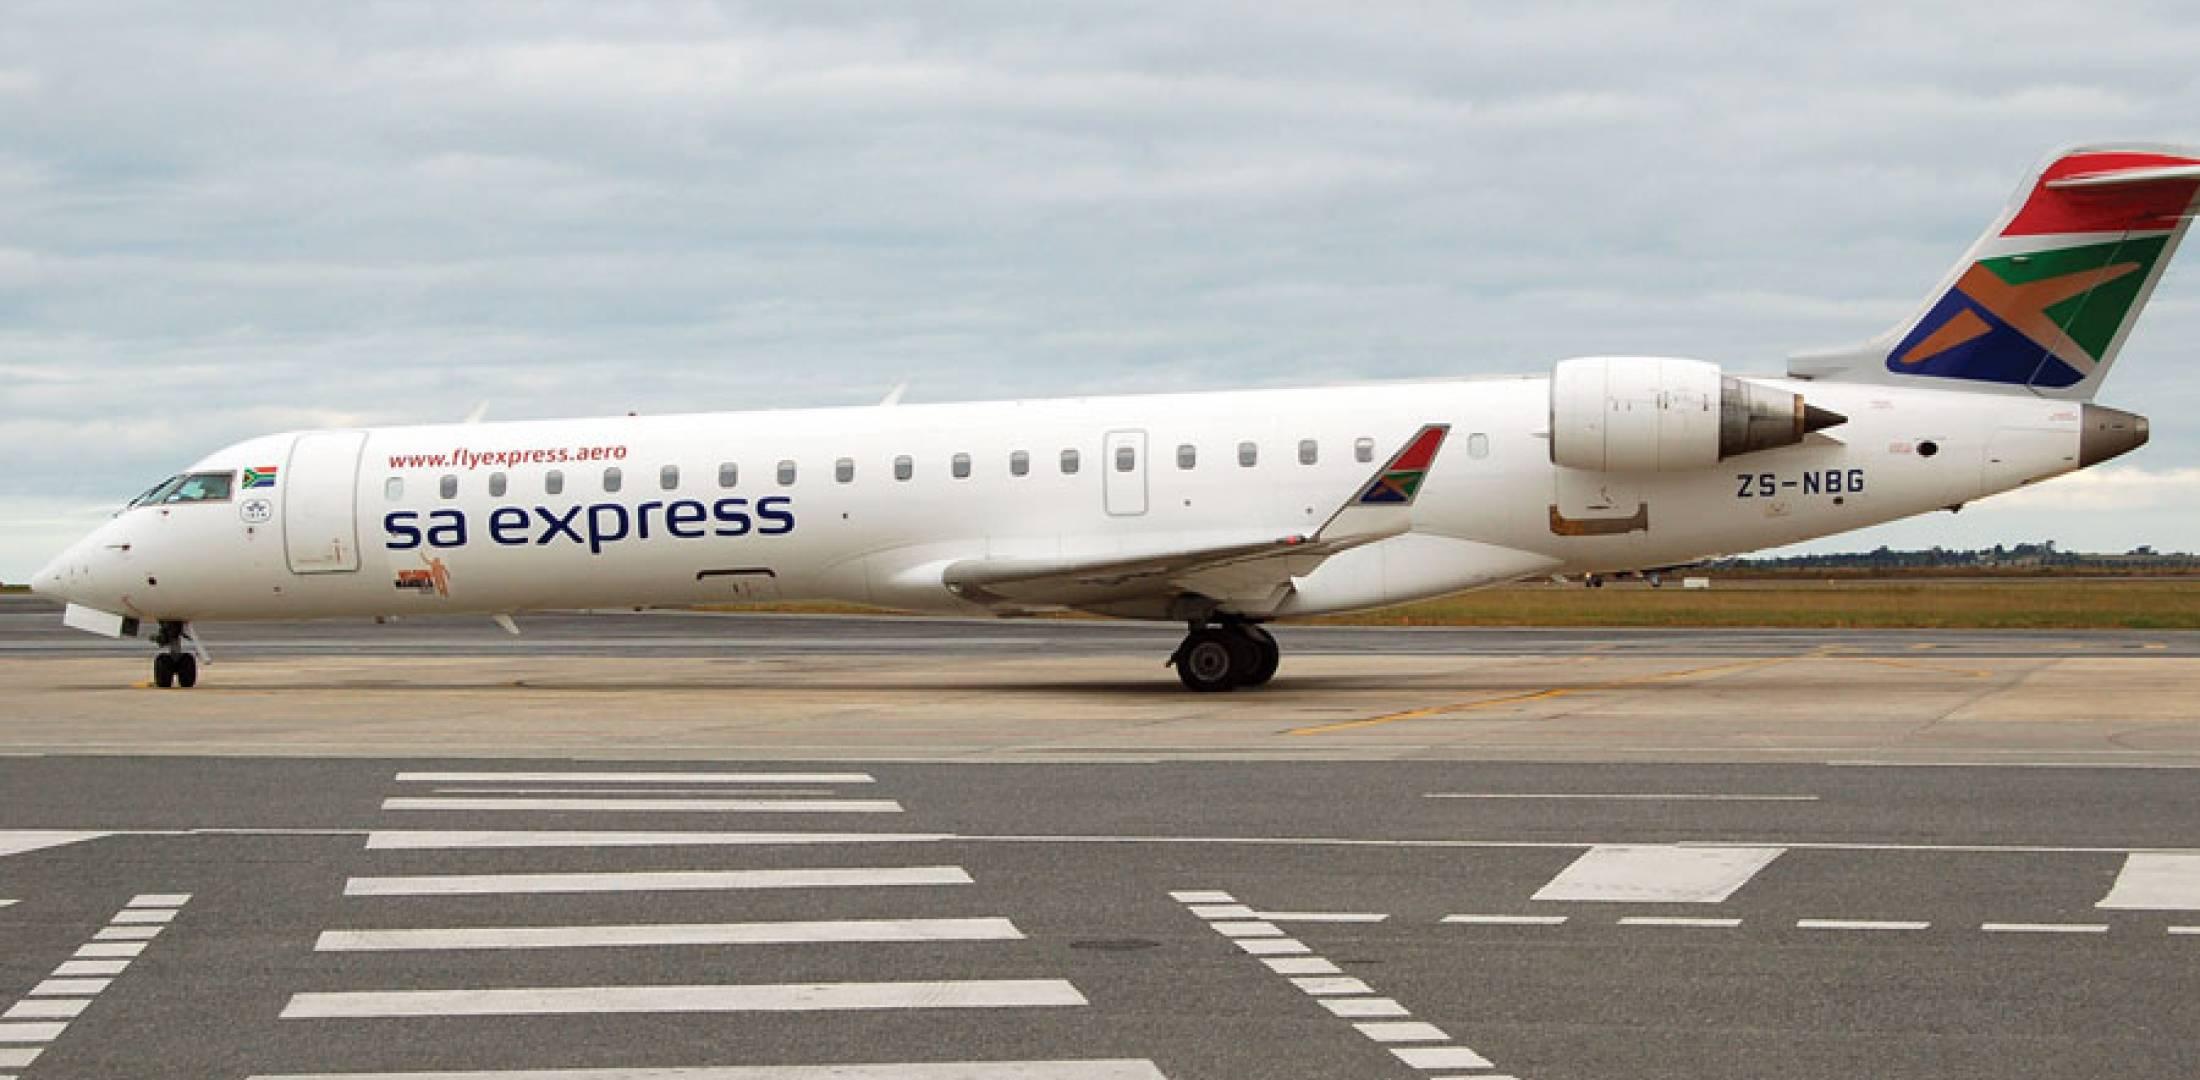 DA welcomes SA Express liquidation process, SAA should follow suit